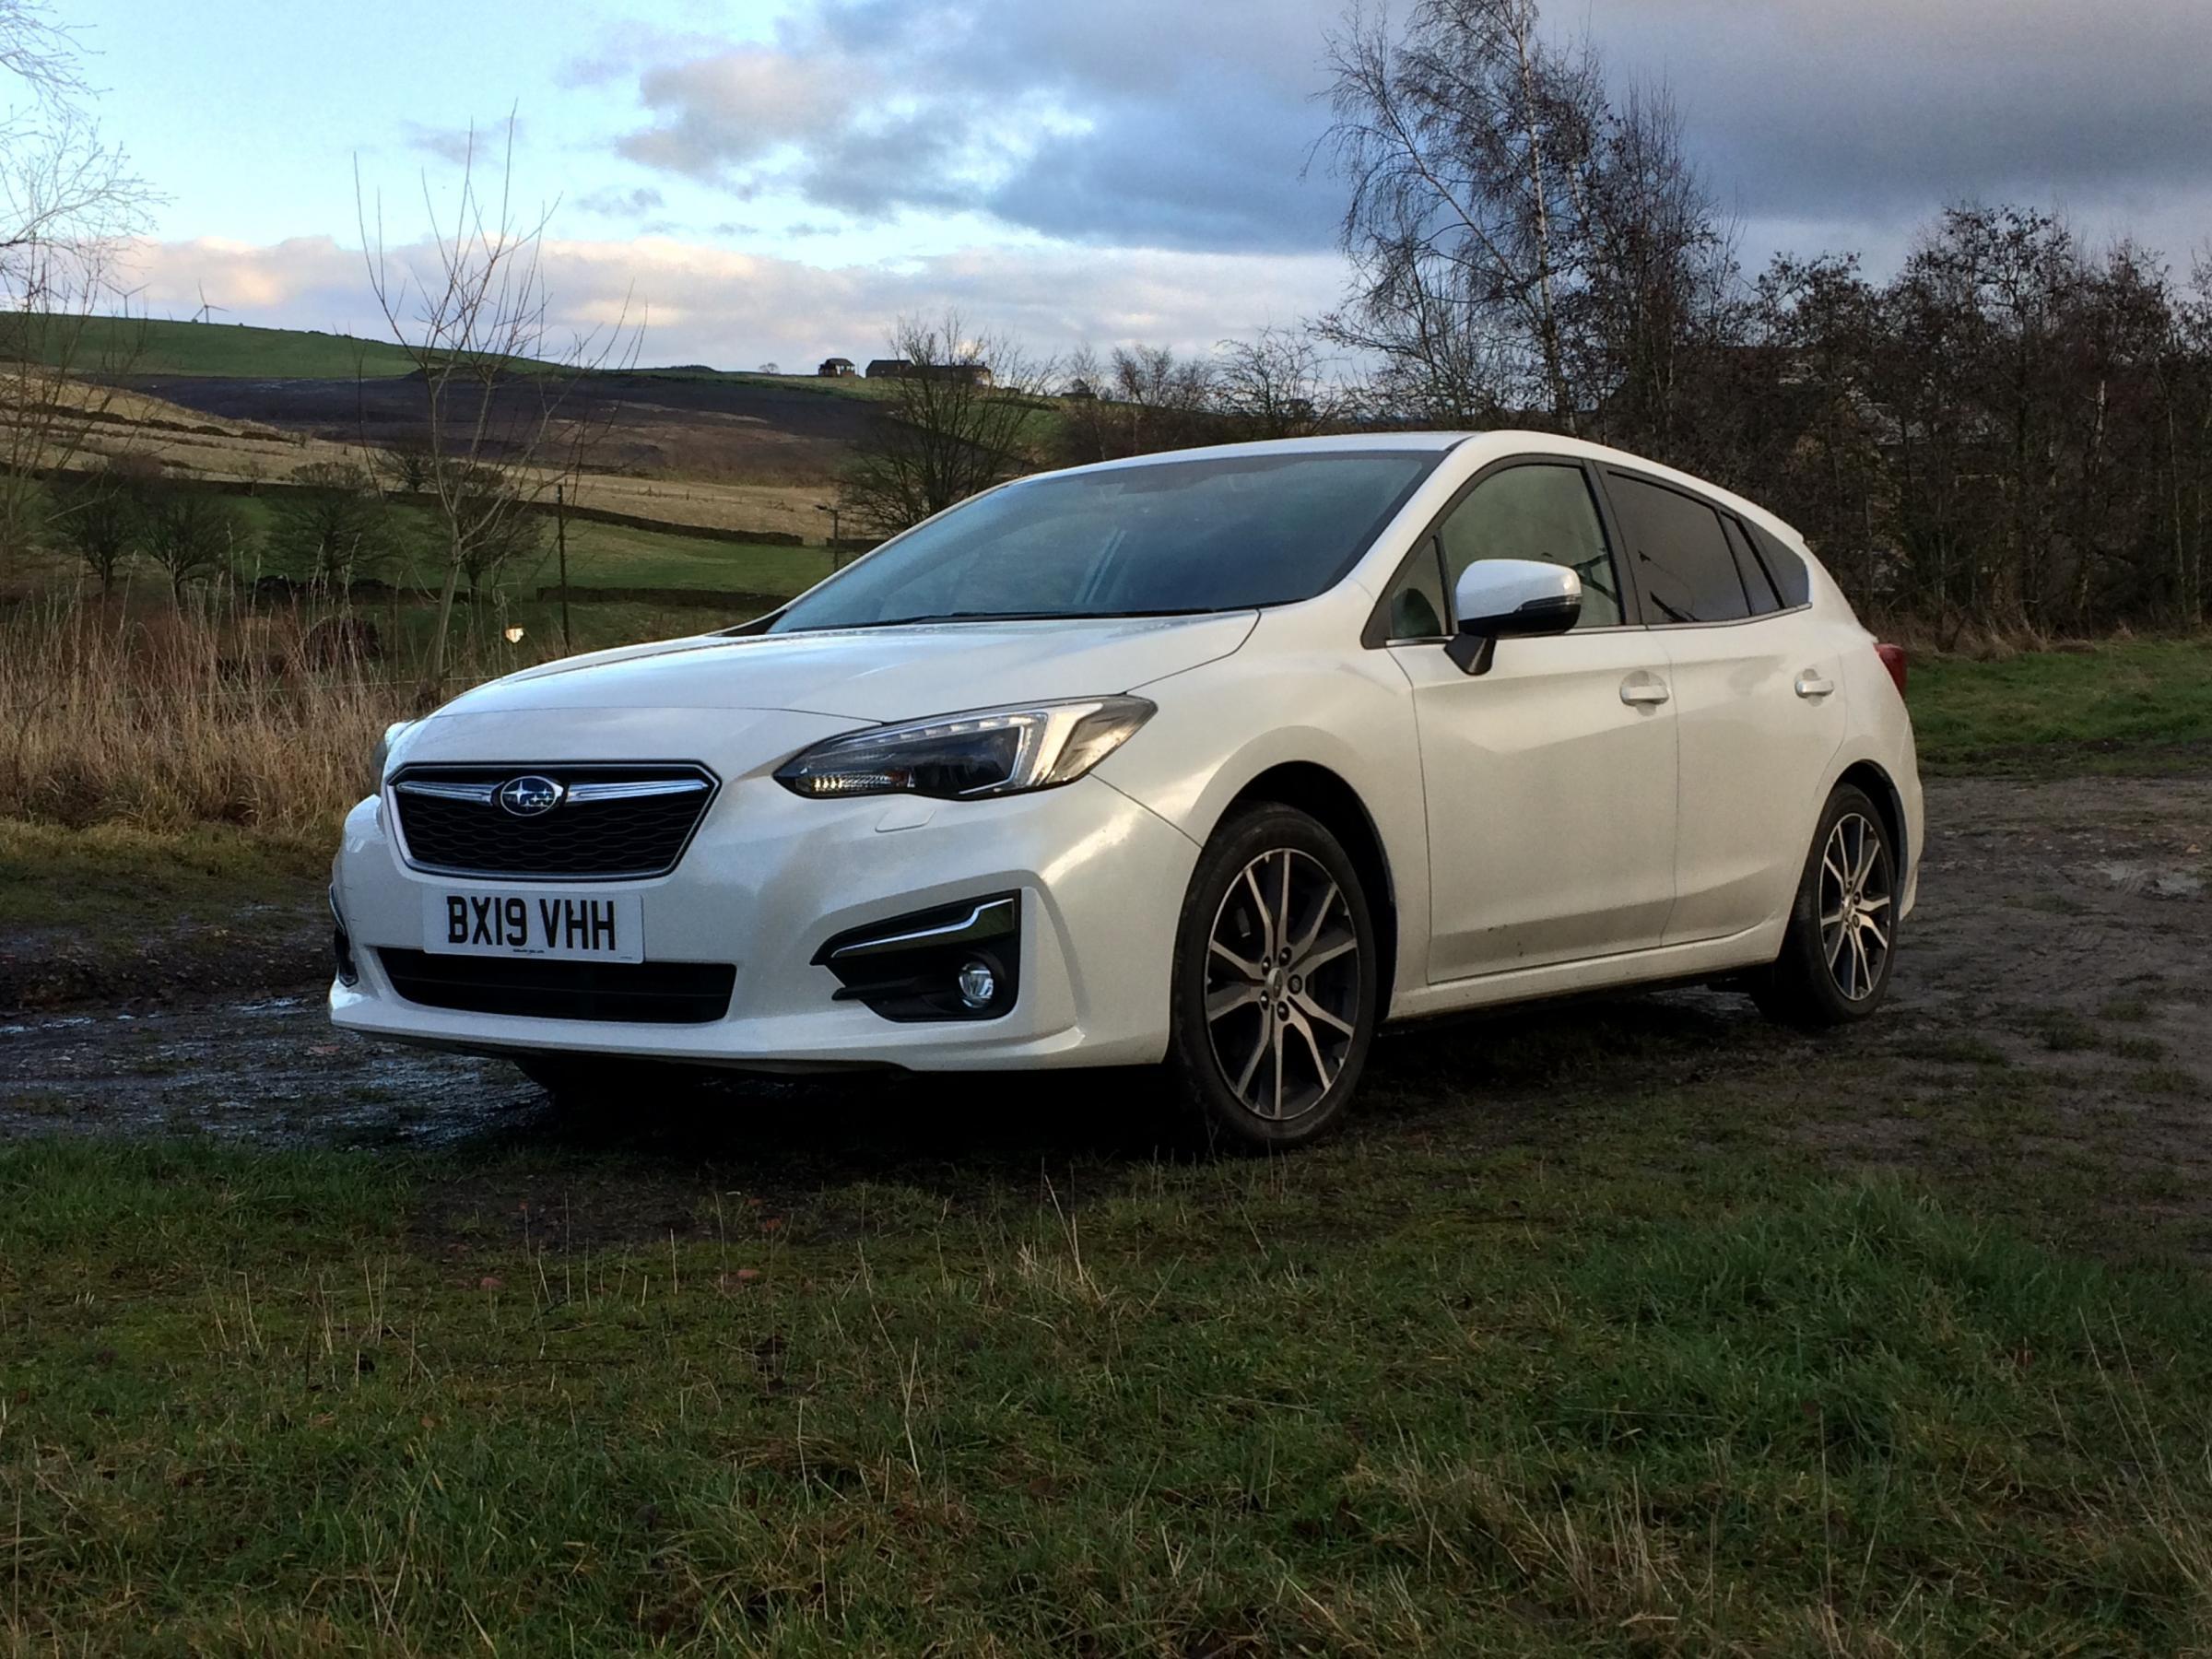 CAR REVIEW: Subaru Impreza nts